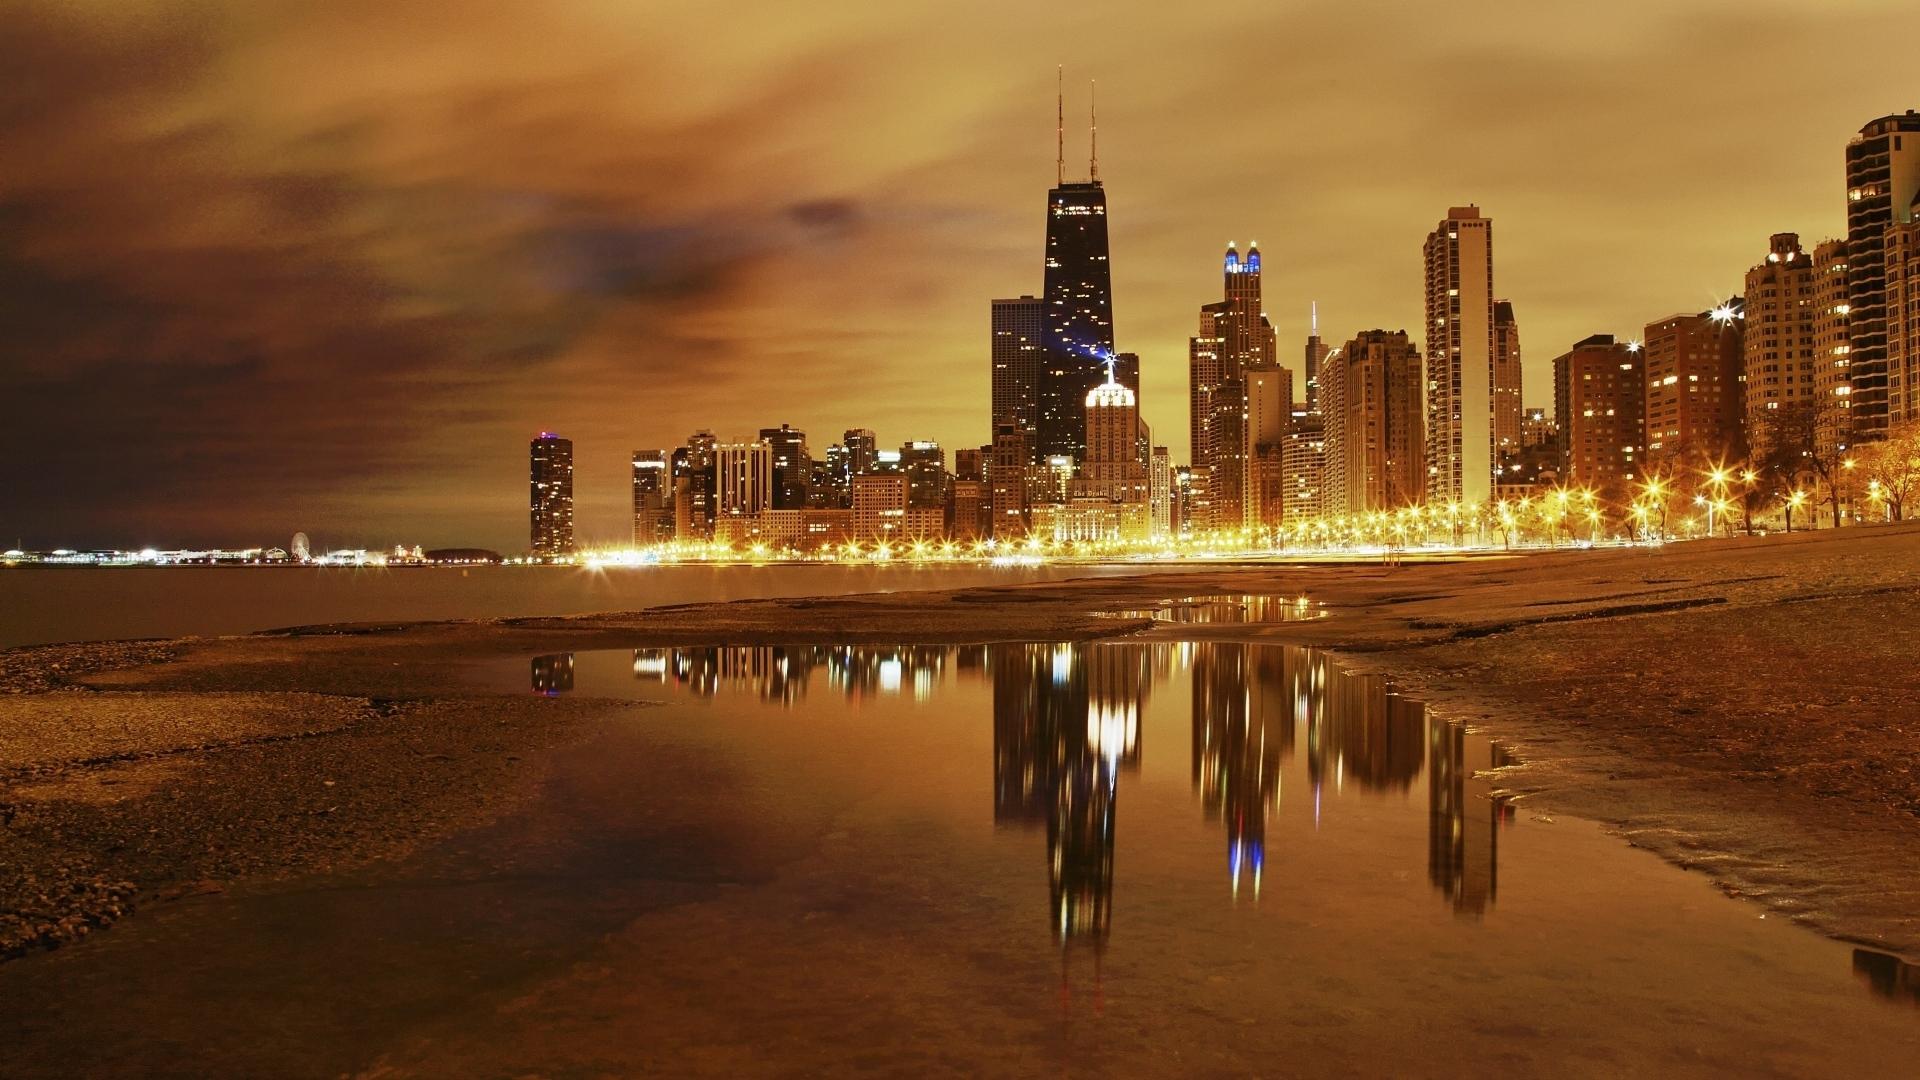 download wallpaper 1920x1080 city, ??chicago, night, lights, lake